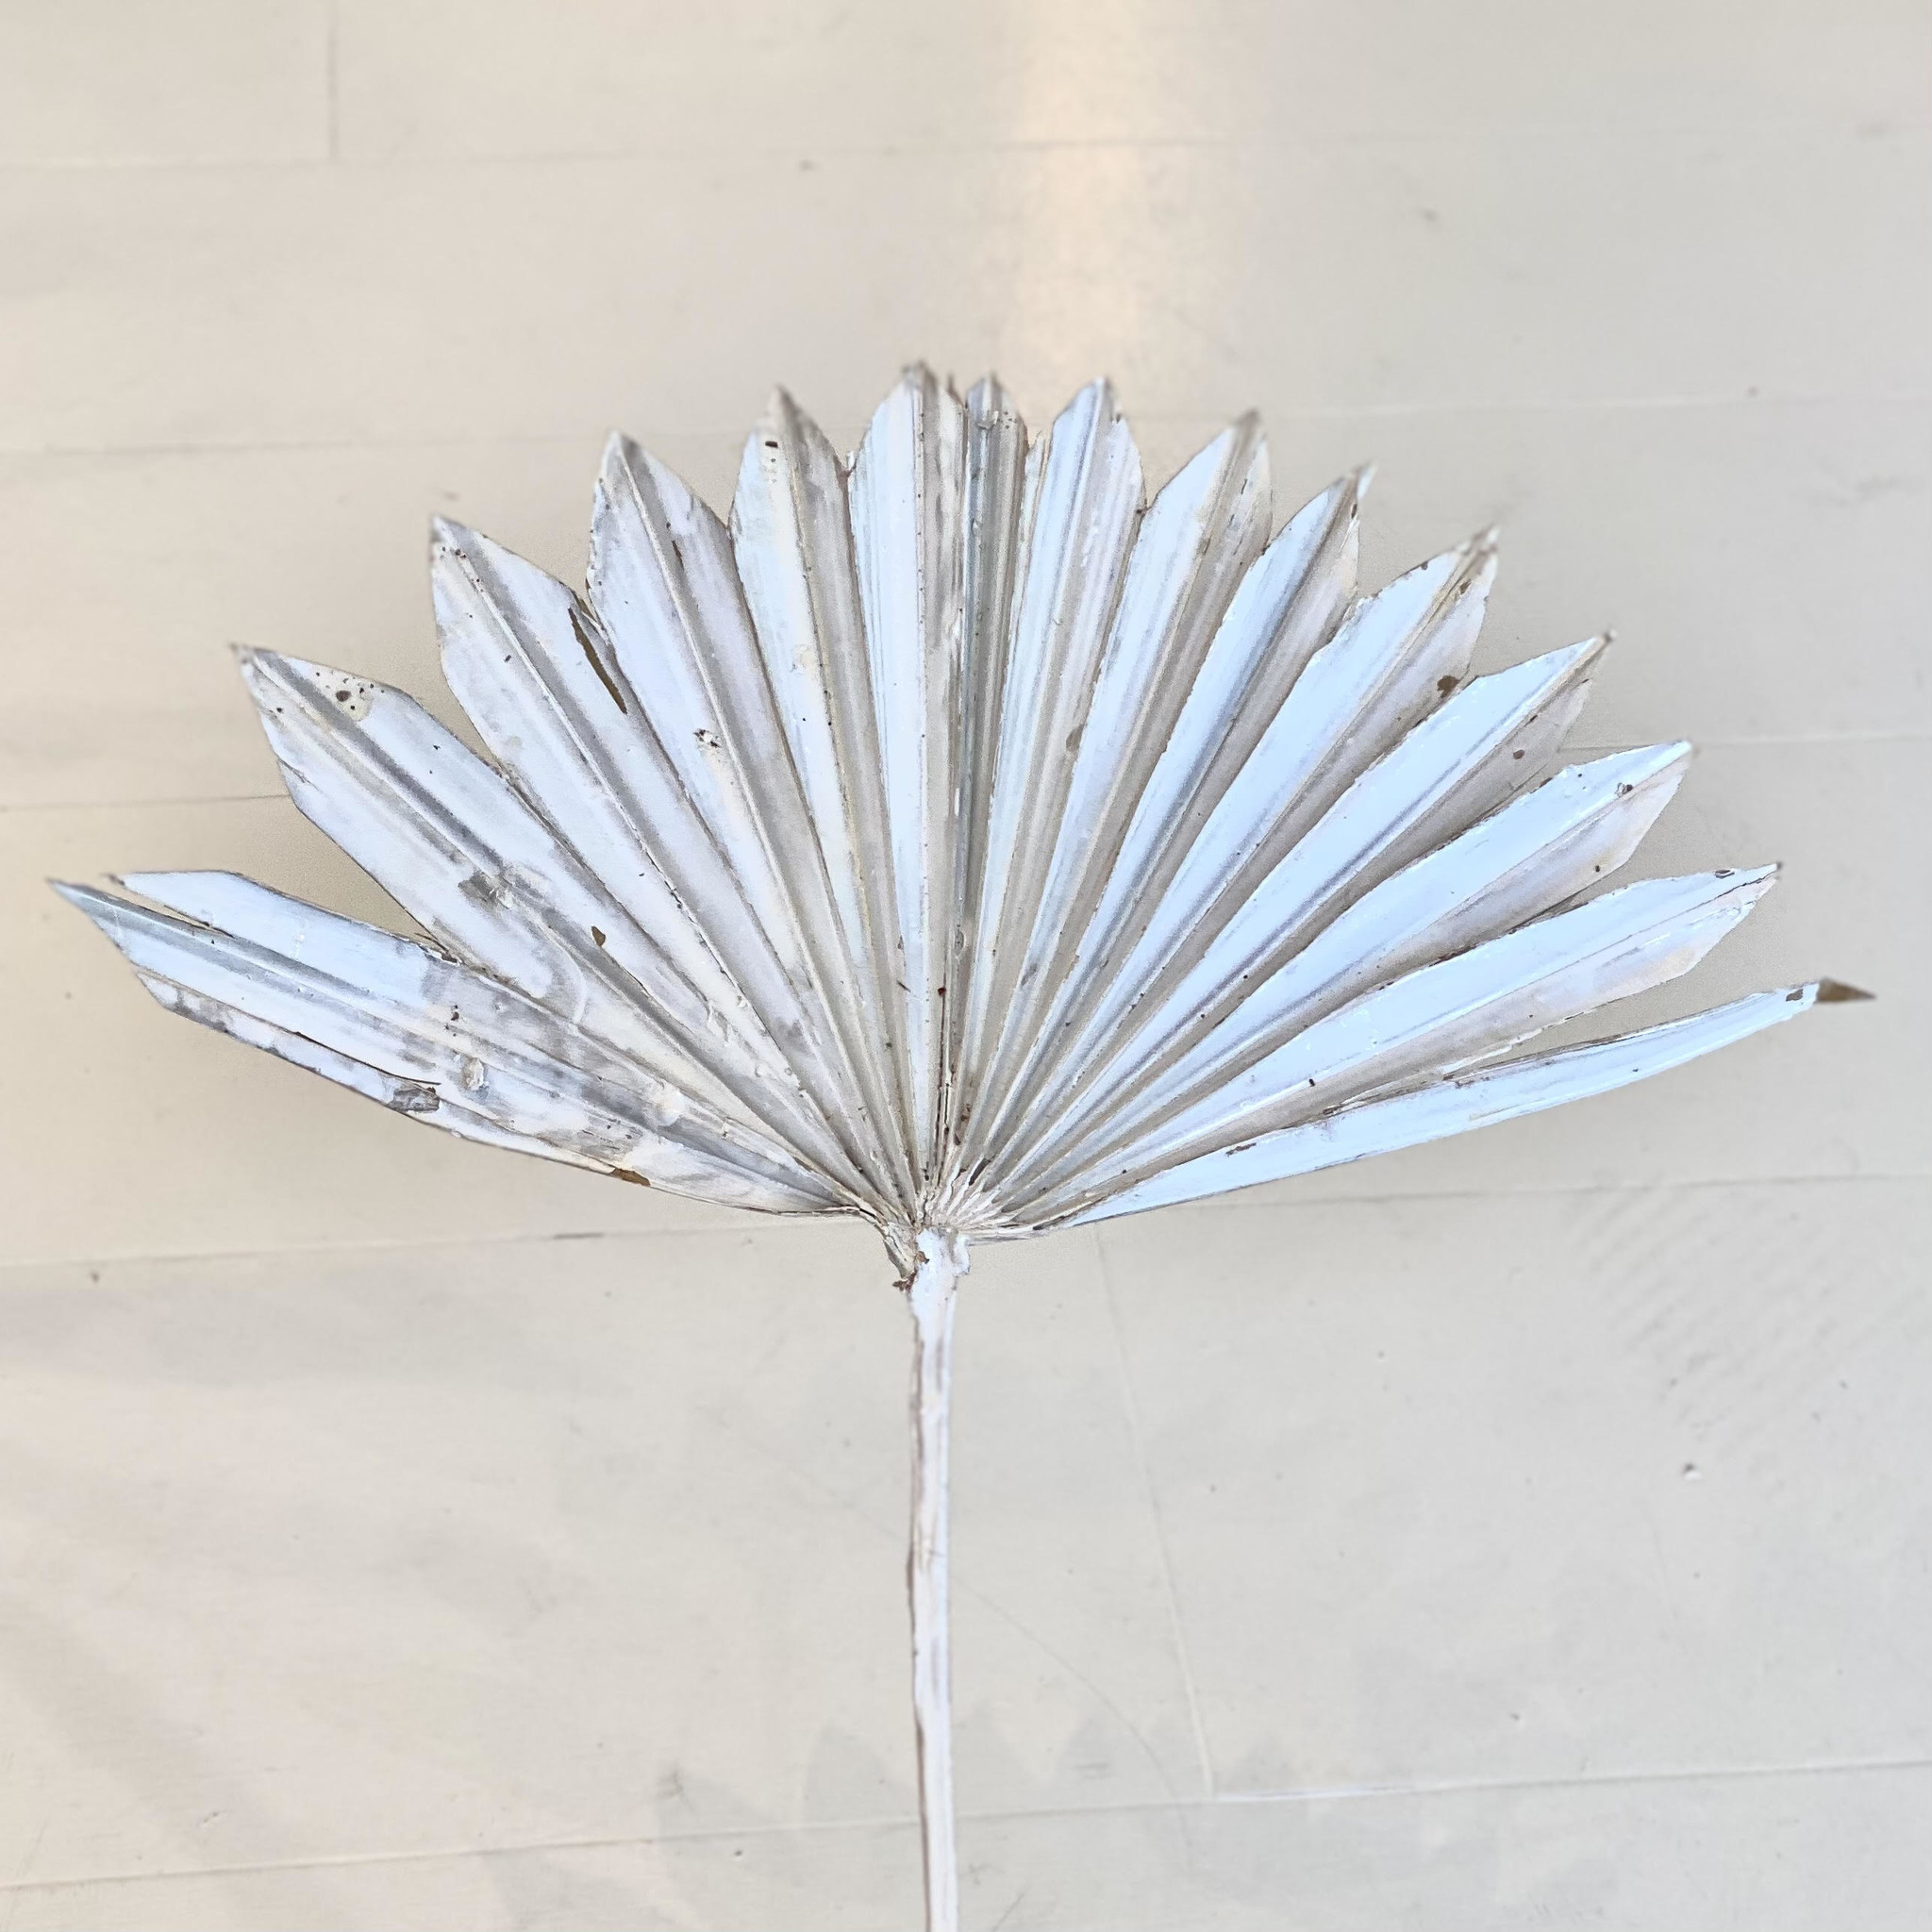 Flowerbar - Palmblad Gebleekt Wit - Atelier Olala-1